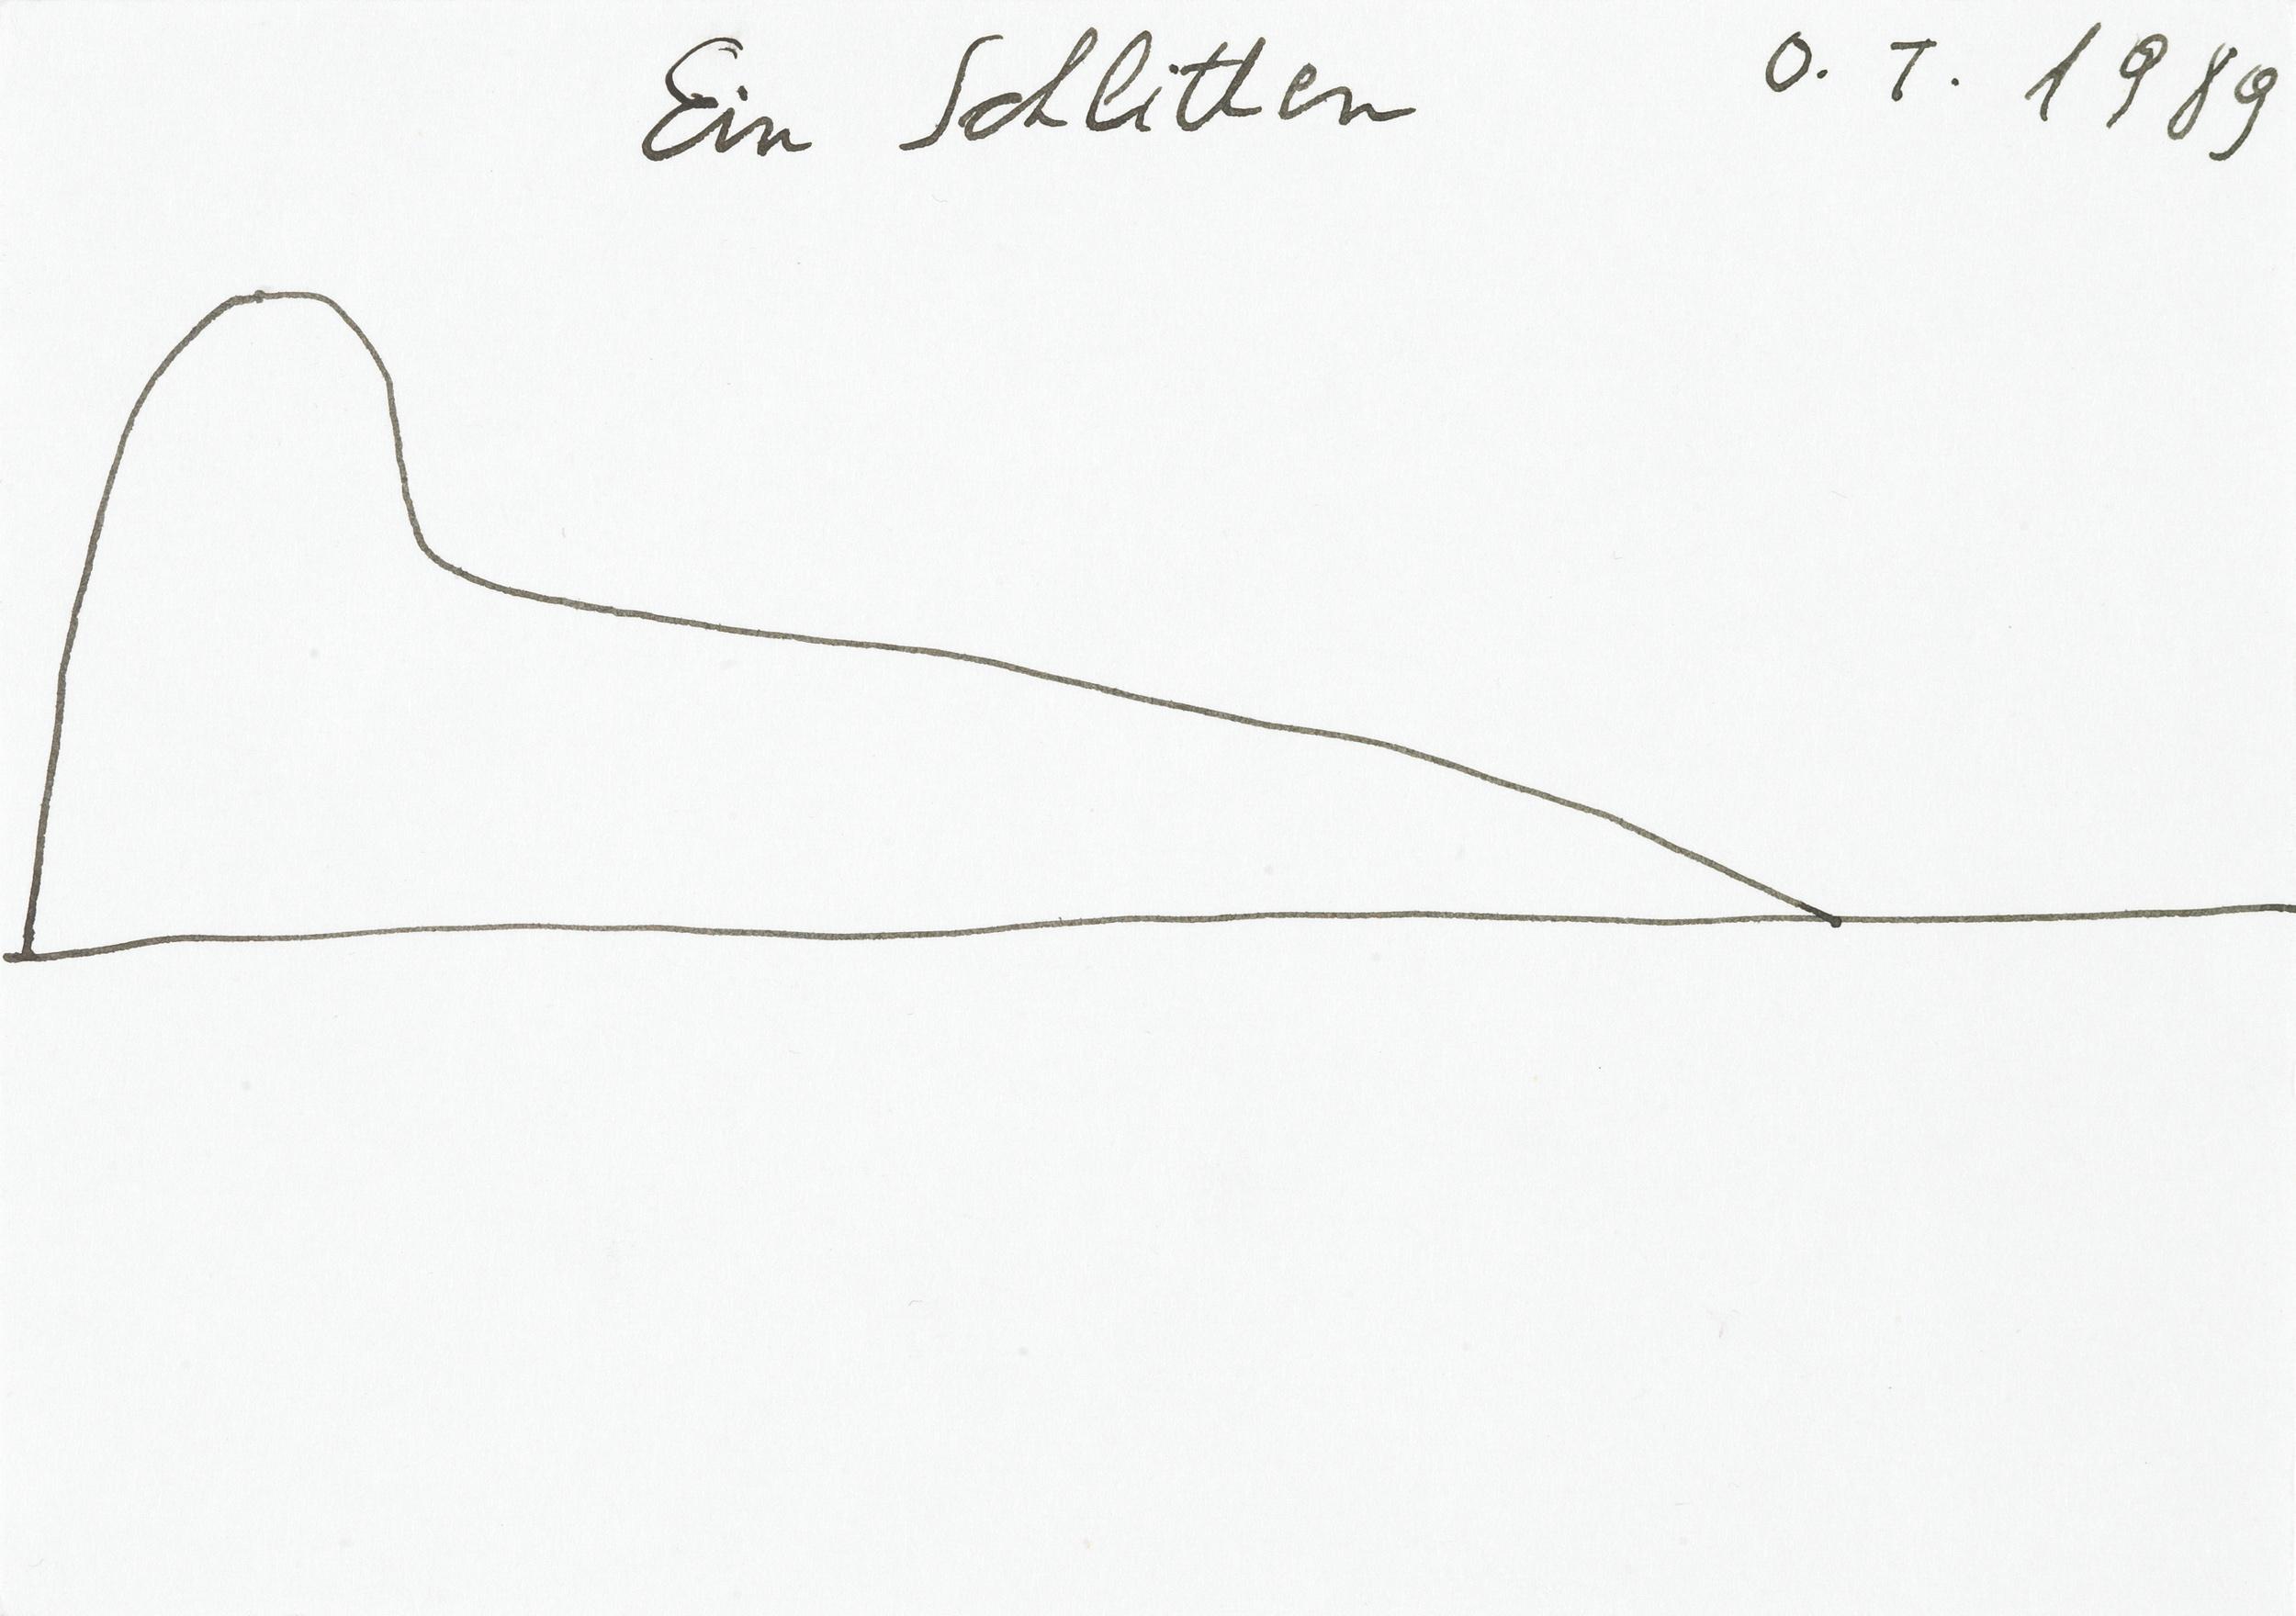 tschirtner oswald - Ein Schlitten / A sledge